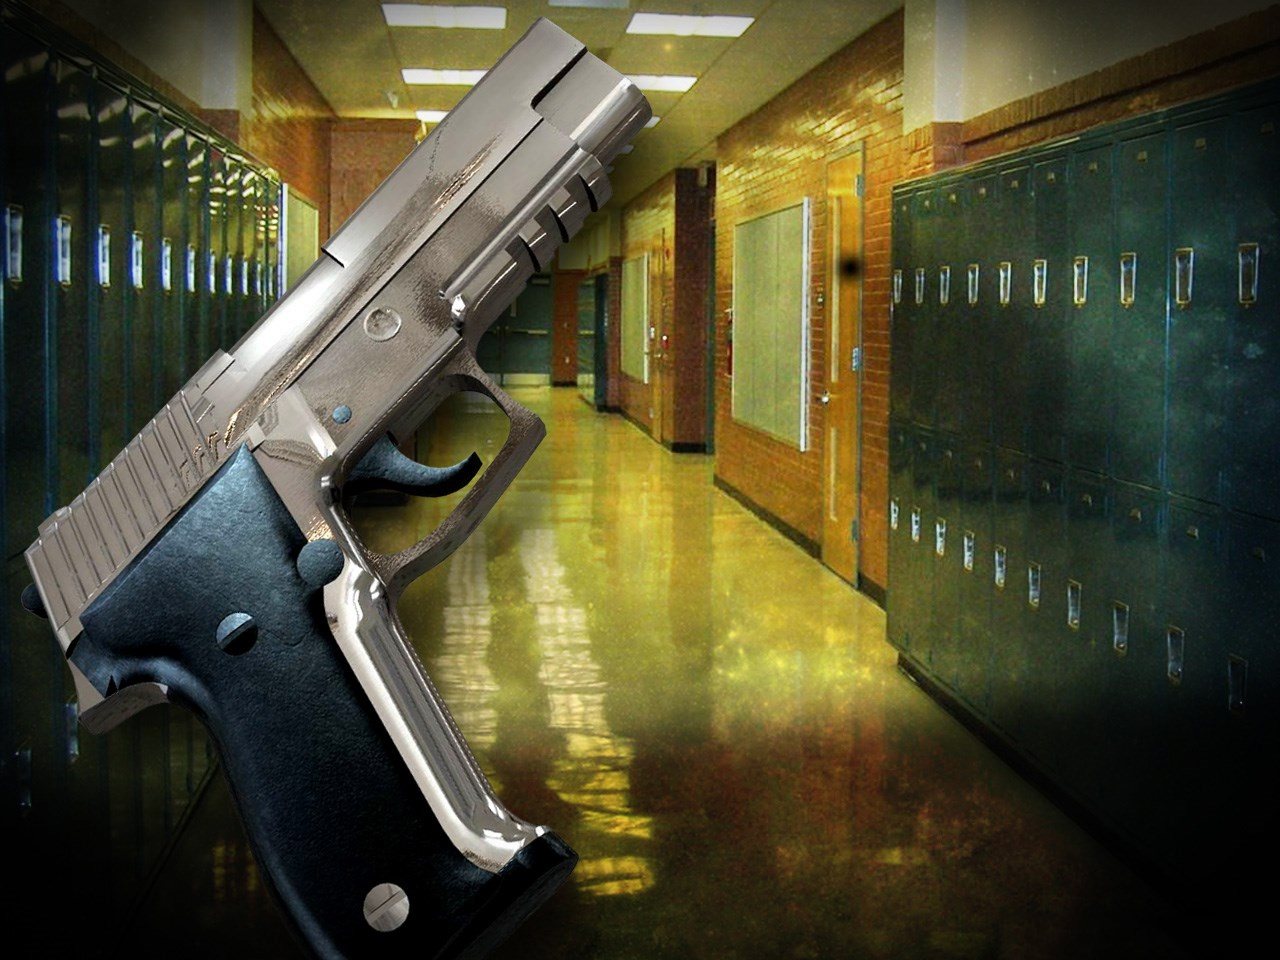 gun in school_1550706112910.jpg.jpg